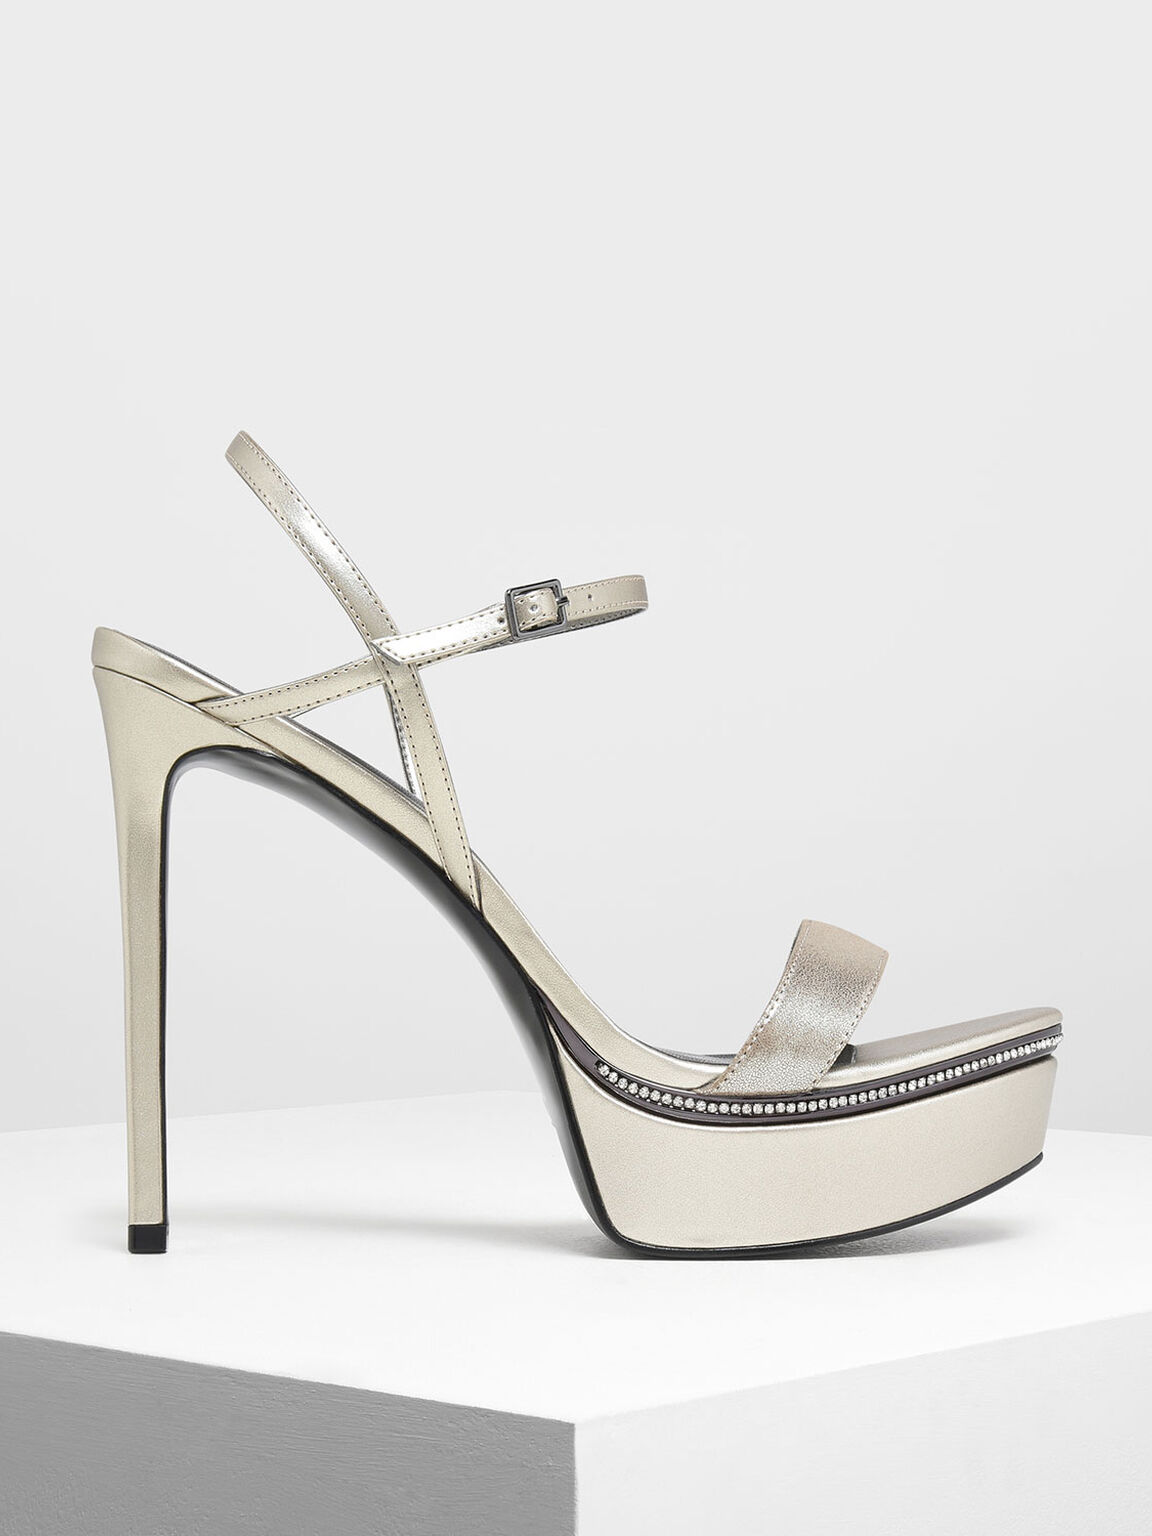 Gem Encrusted Metallic Platform Heels, Silver, hi-res